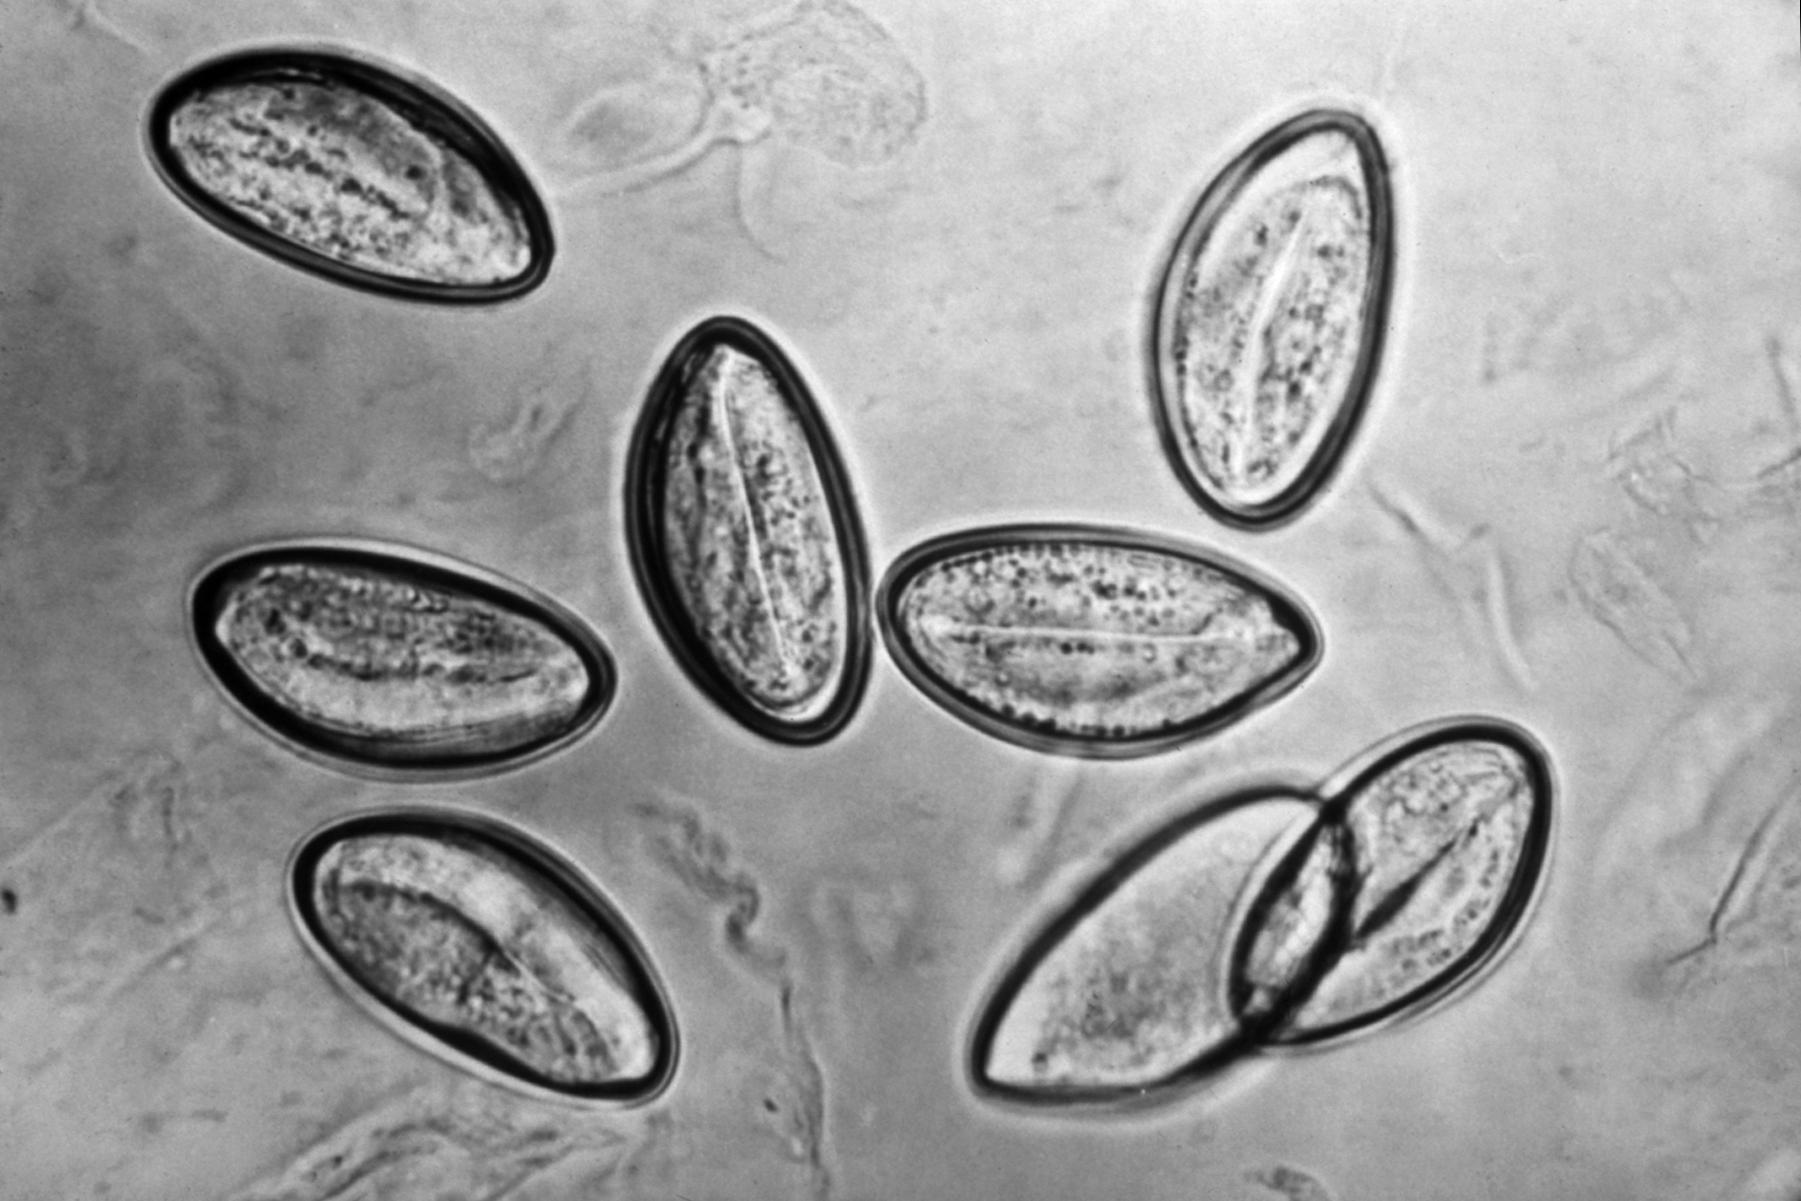 enterobius vermicularis zoonosis